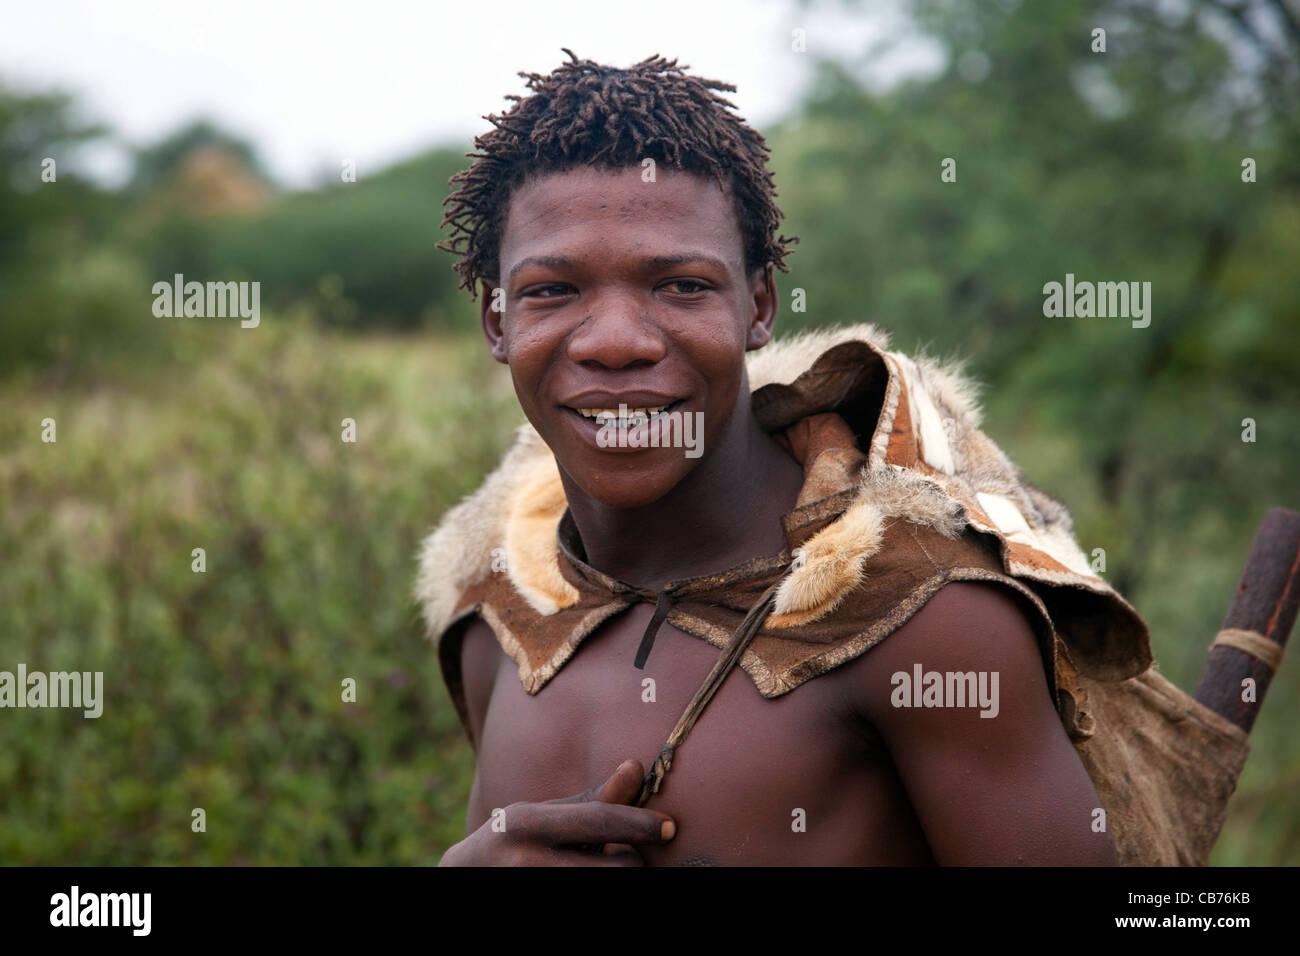 Bushman dressed in animal skin in the Kalahari desert near Ghanzi, Botswana, Africa - Stock Image